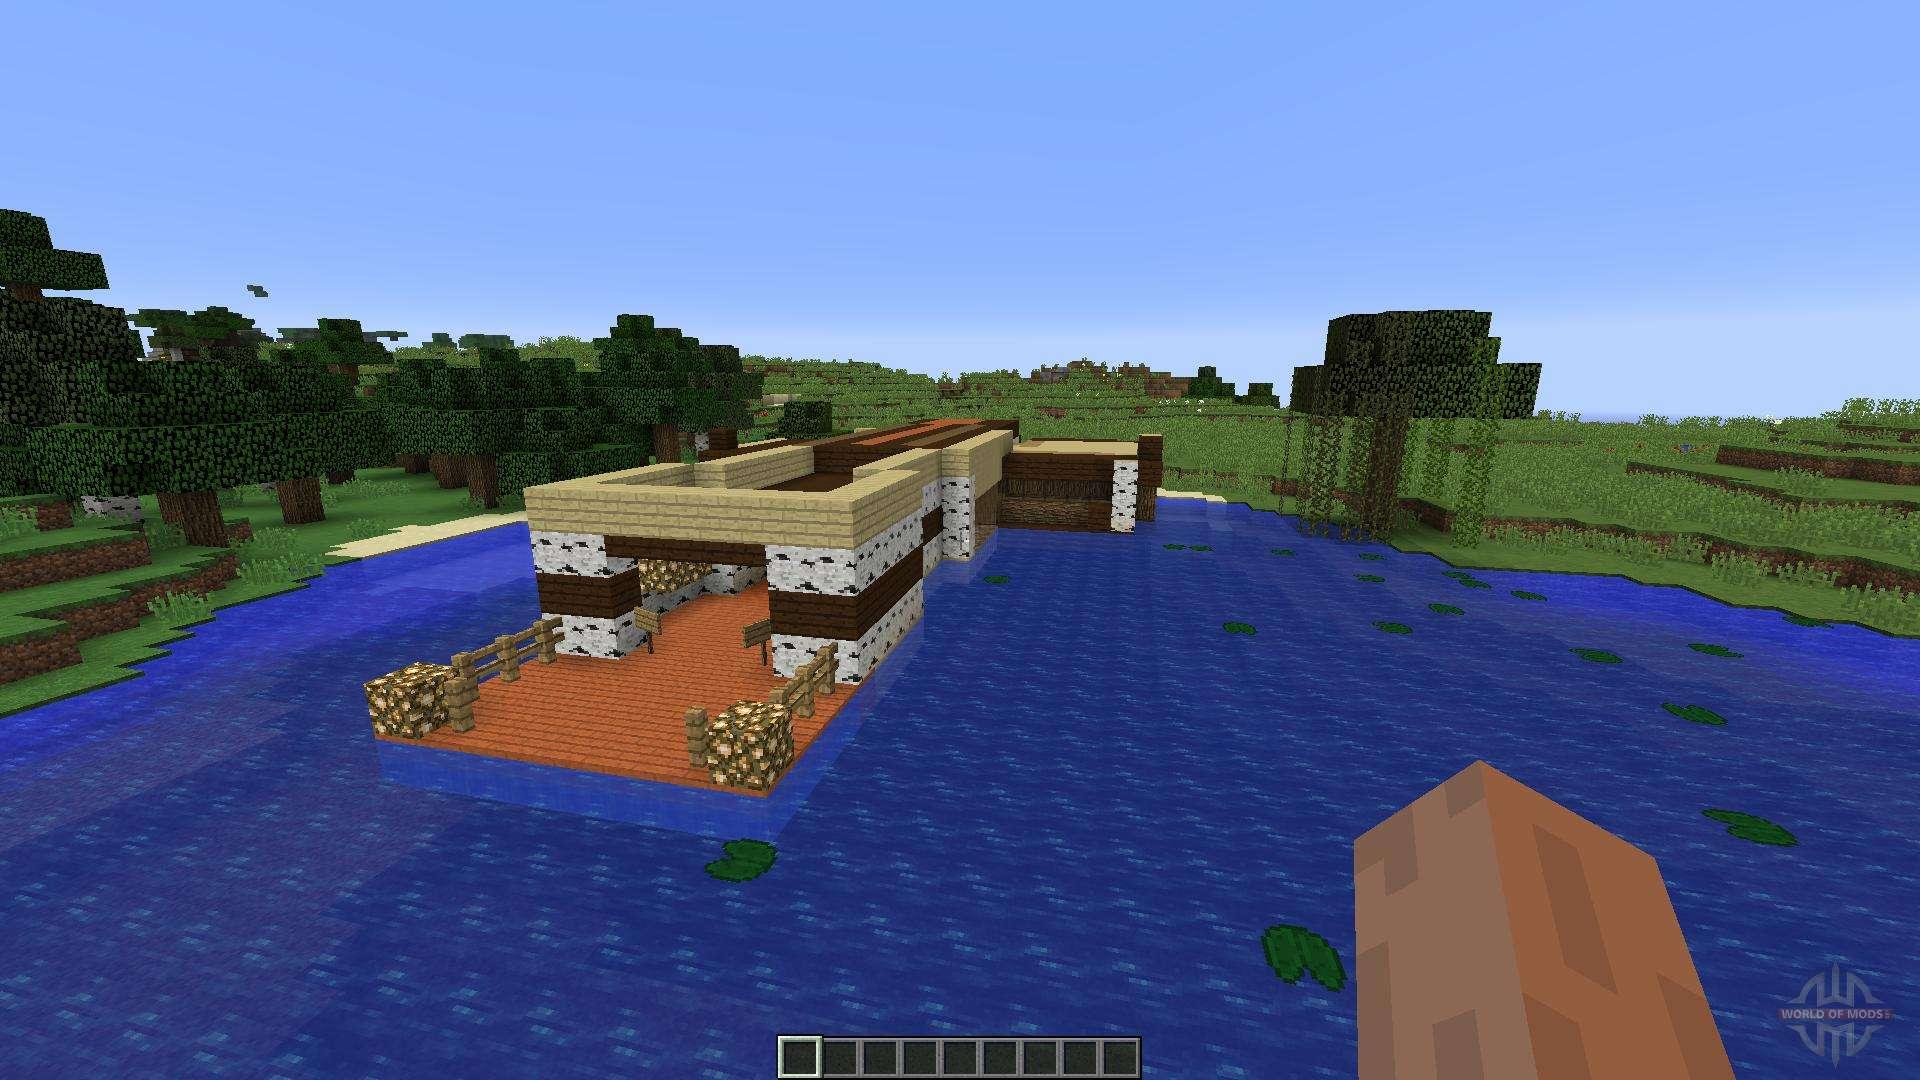 minecraft fishing house - HD1920×1080